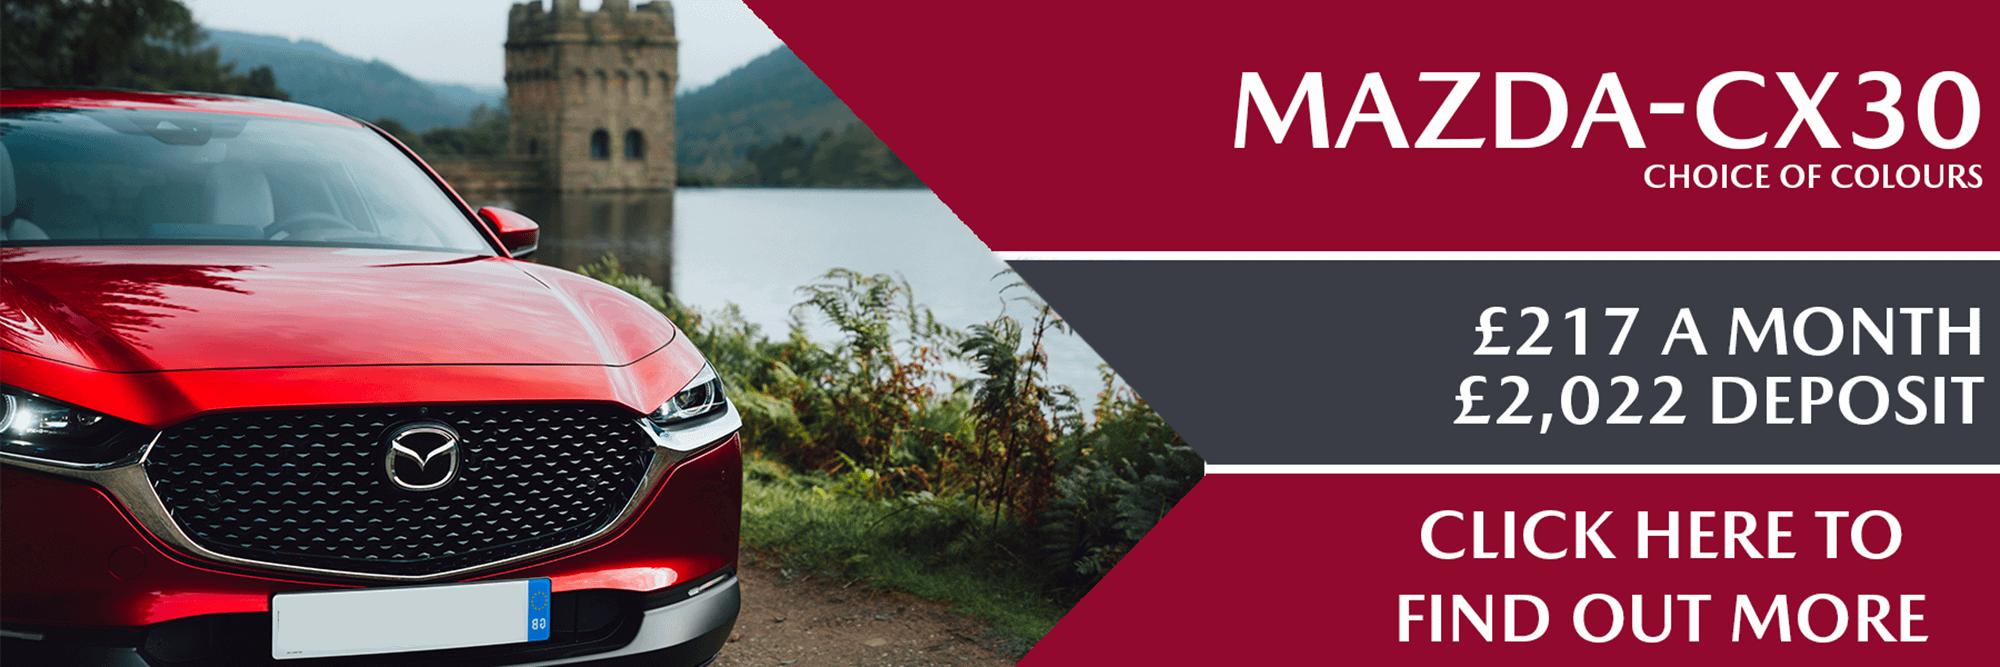 Mazda CX-30 Offers